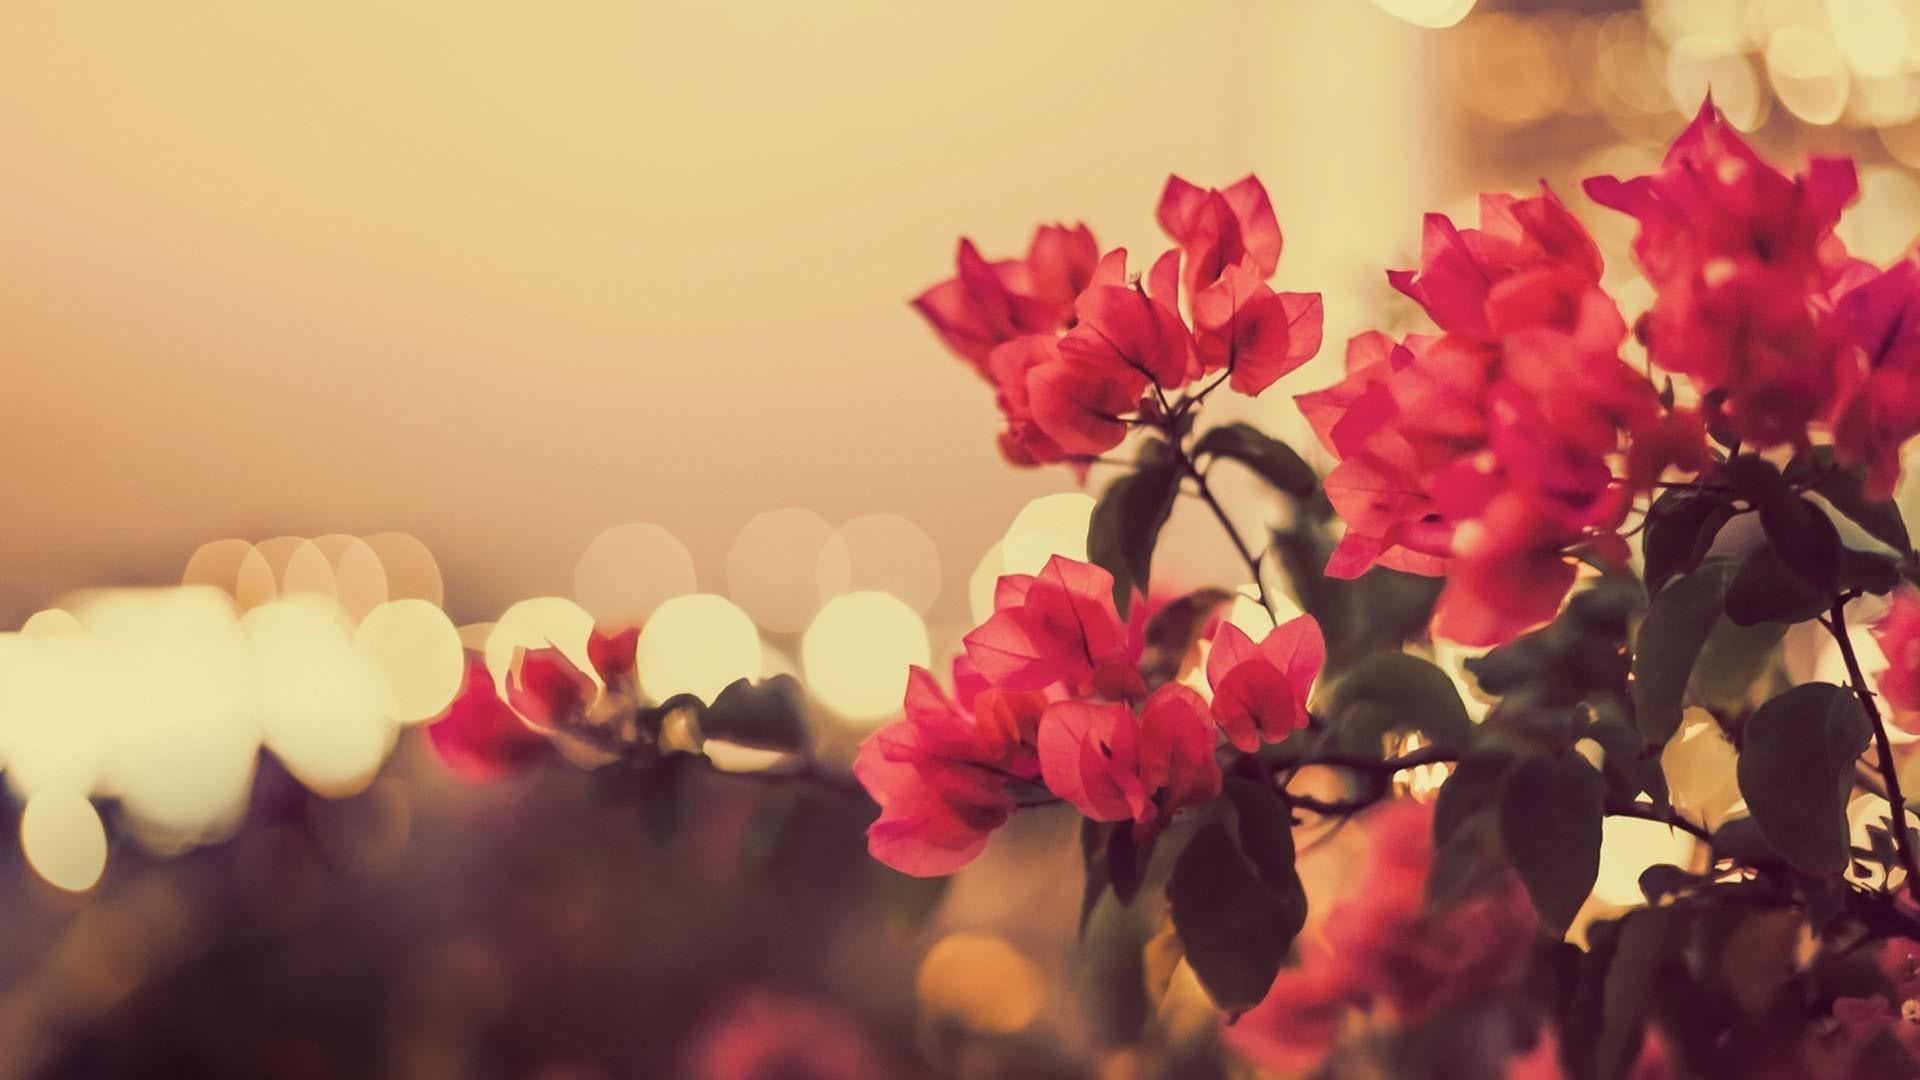 Vintage Flower Backgrounds 49 Pictures